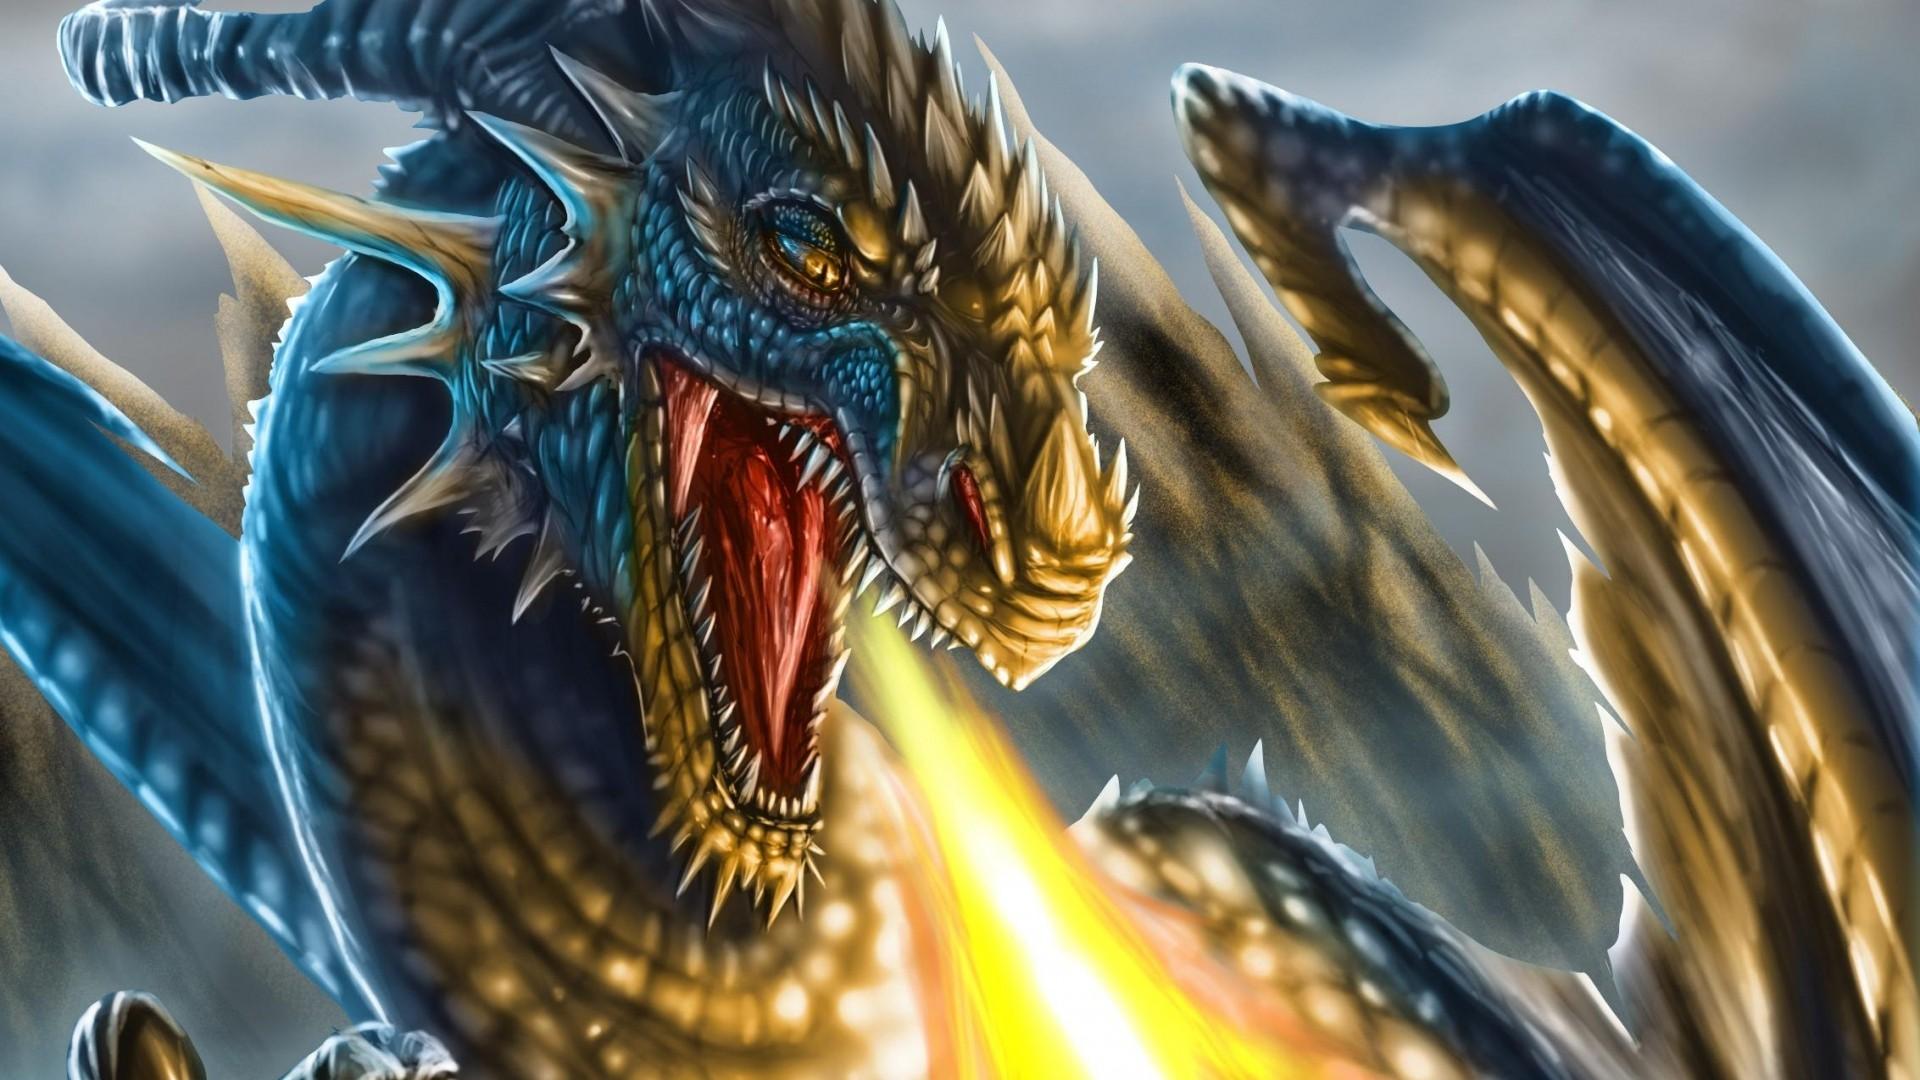 Wallpaper Face Fantasy Art Wings Fire Dragon Teeth Dragon Wings Mythology Head Scales Wing Screenshot Computer Wallpaper Fictional Character 1920x1080 Jt42 110445 Hd Wallpapers Wallhere